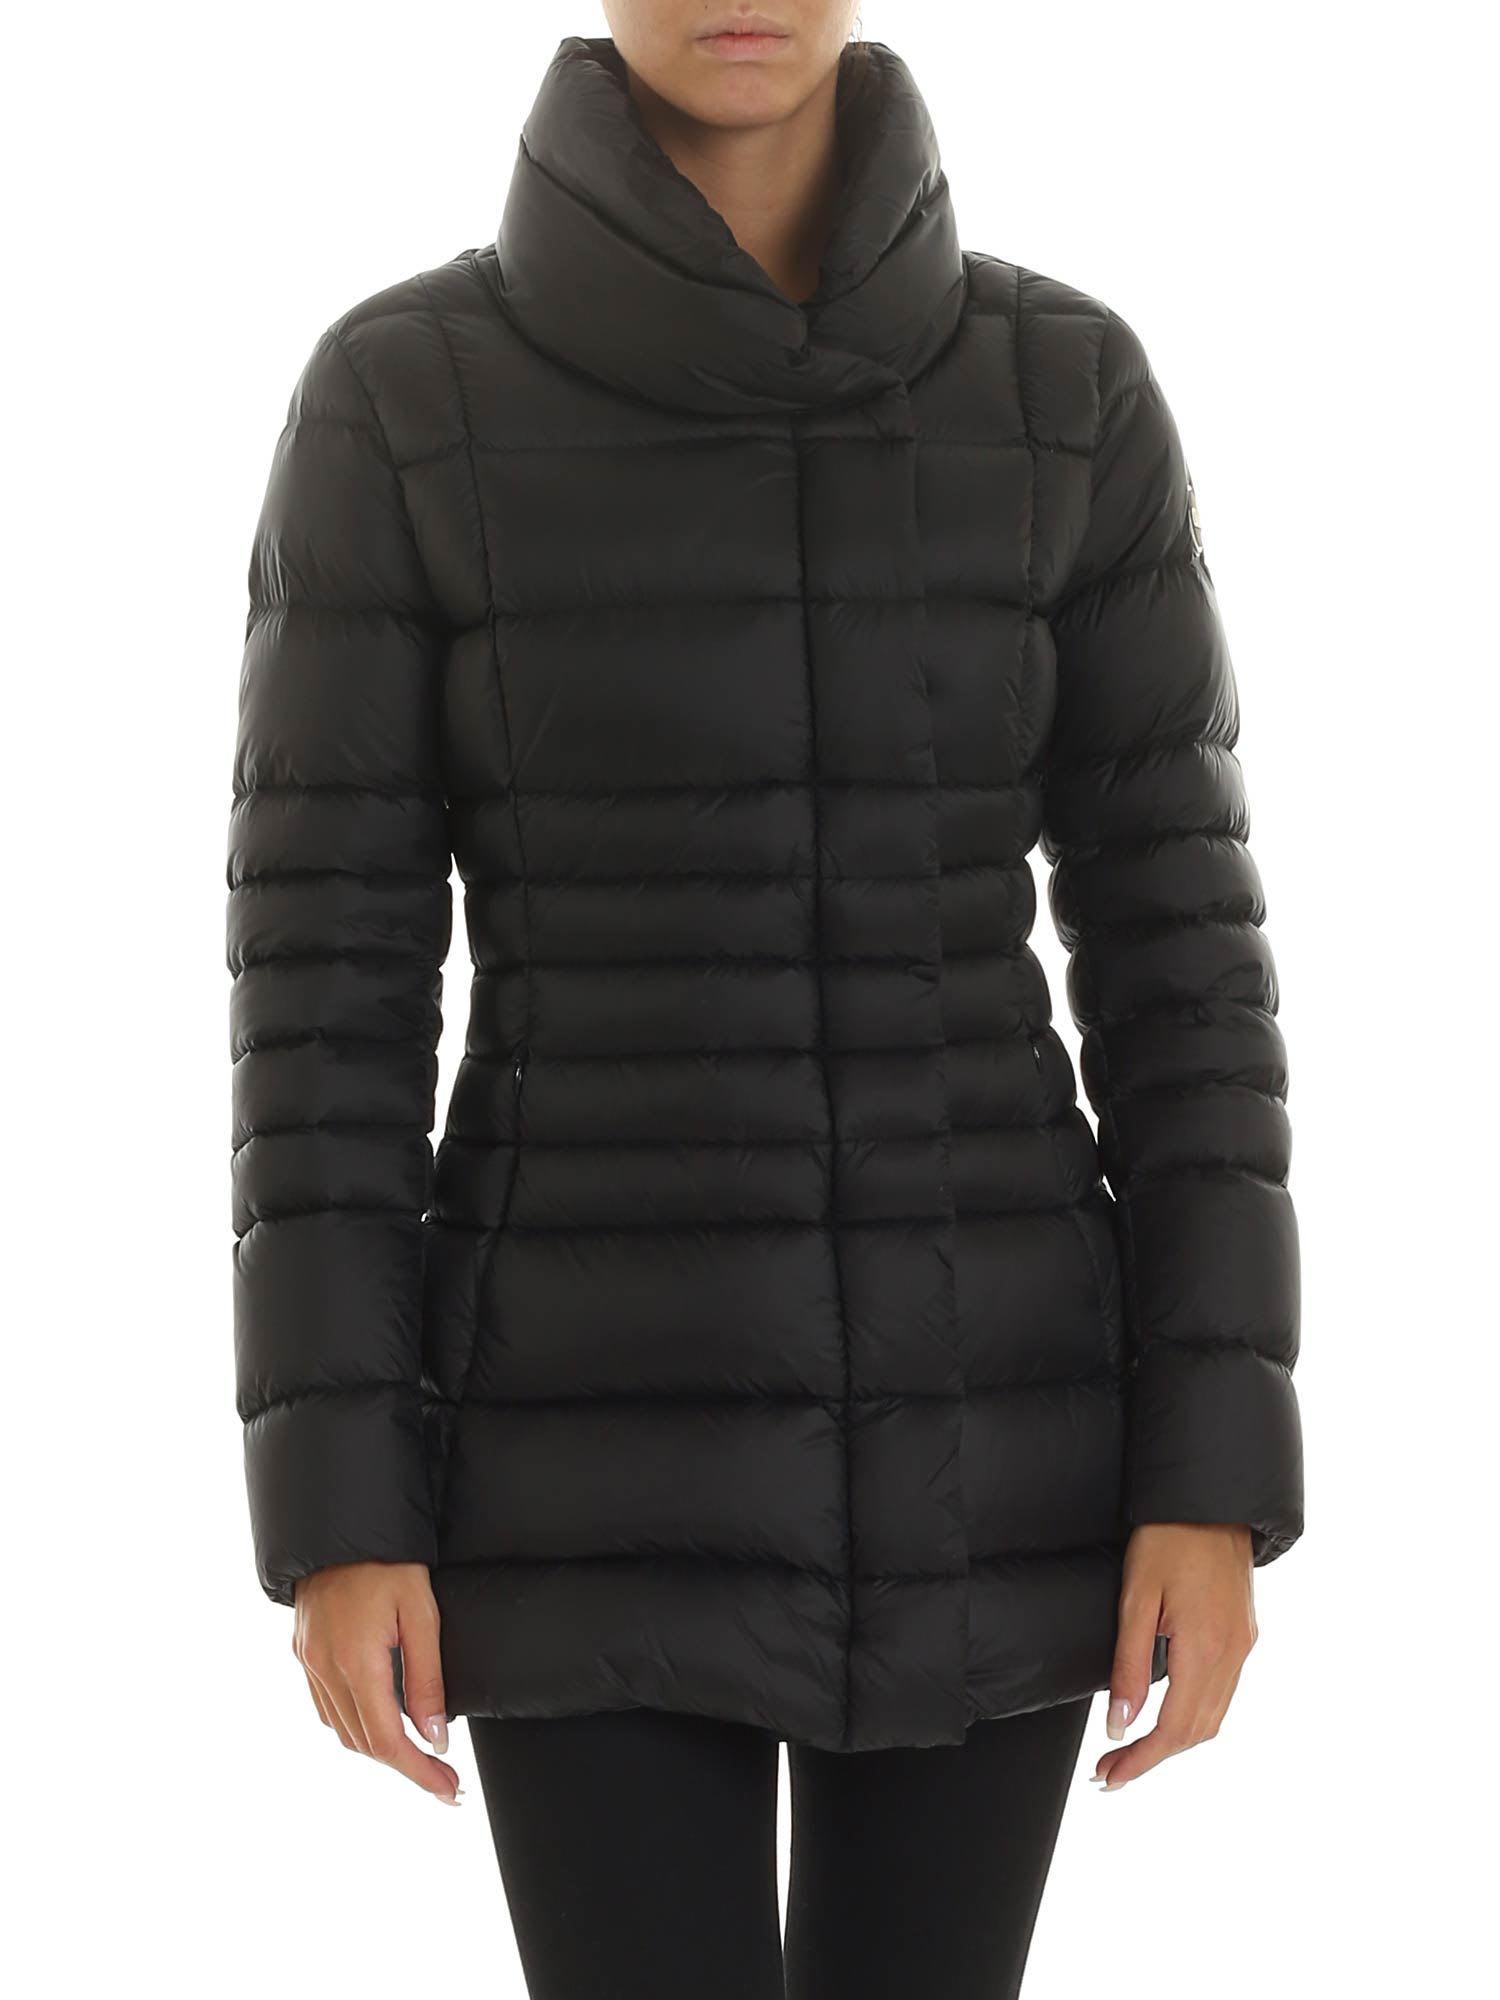 Colmar High Neck Down Jacket